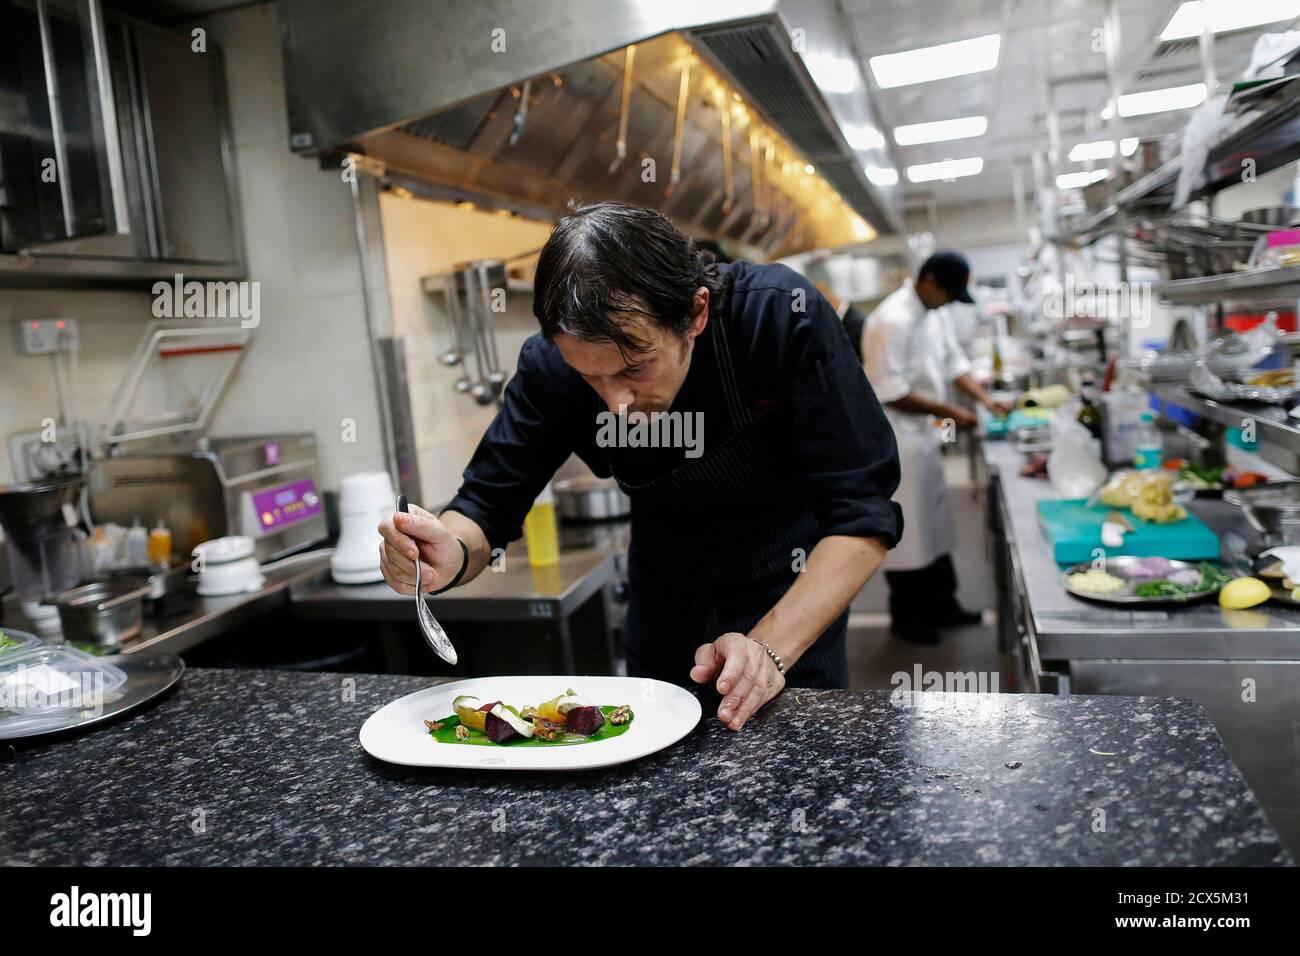 Matteo Boglione Executive Chef Of Le Cirque Signature Restaurant Prepares A Dish Inside The Kitchen In Mumbai December 7 2013 The Branch Of New York S Venerable Le Cirque At The Leela Mumbai